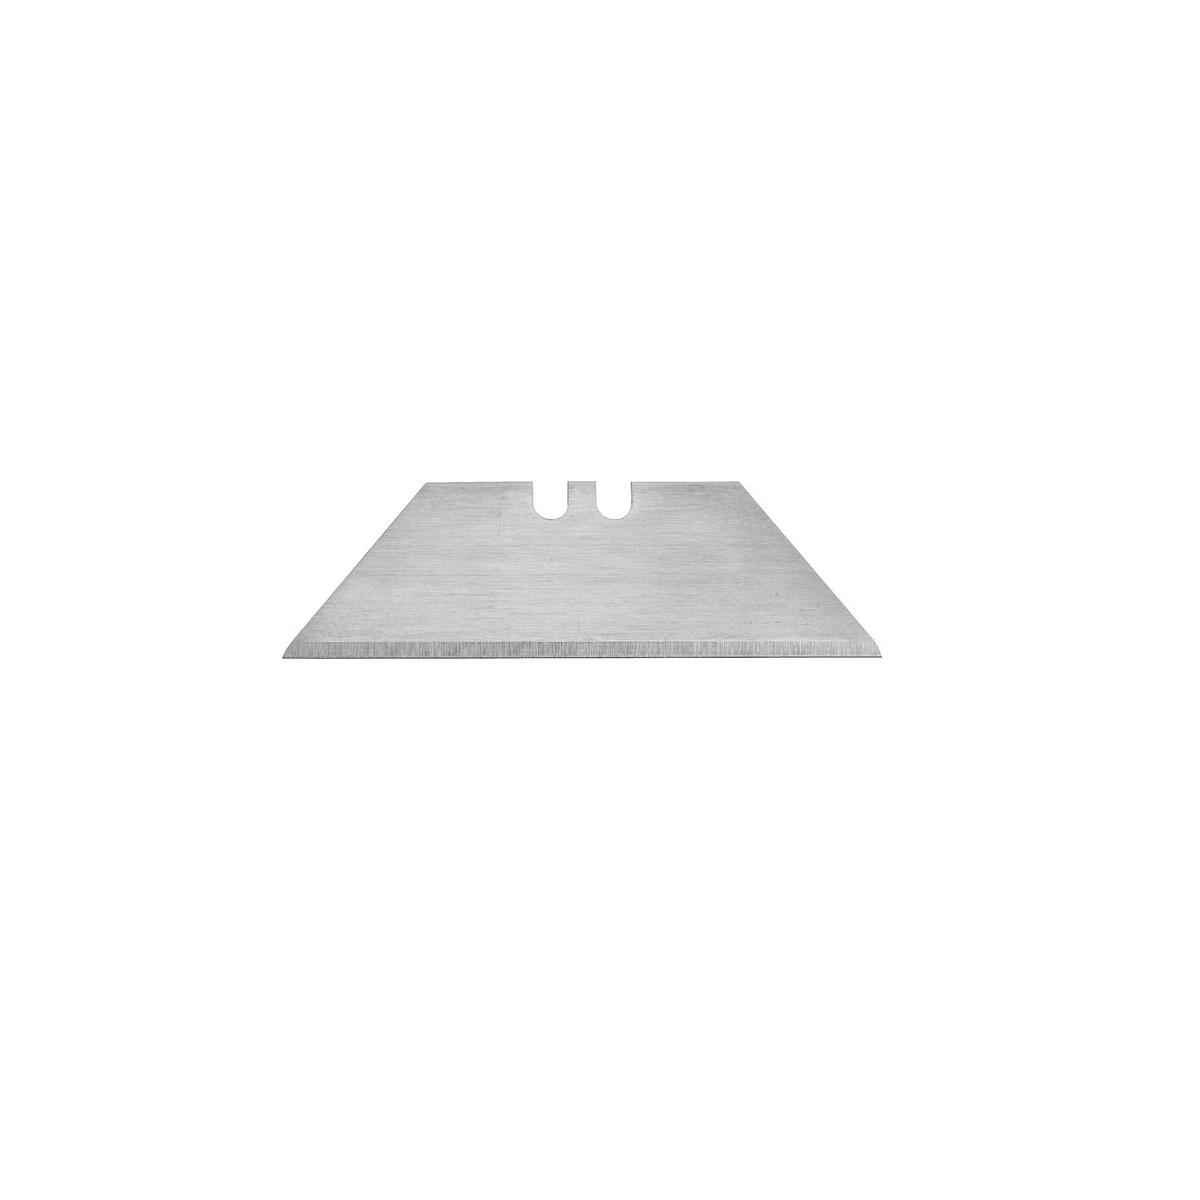 Lâmina trapezoidal para estilete VONDER Construtor